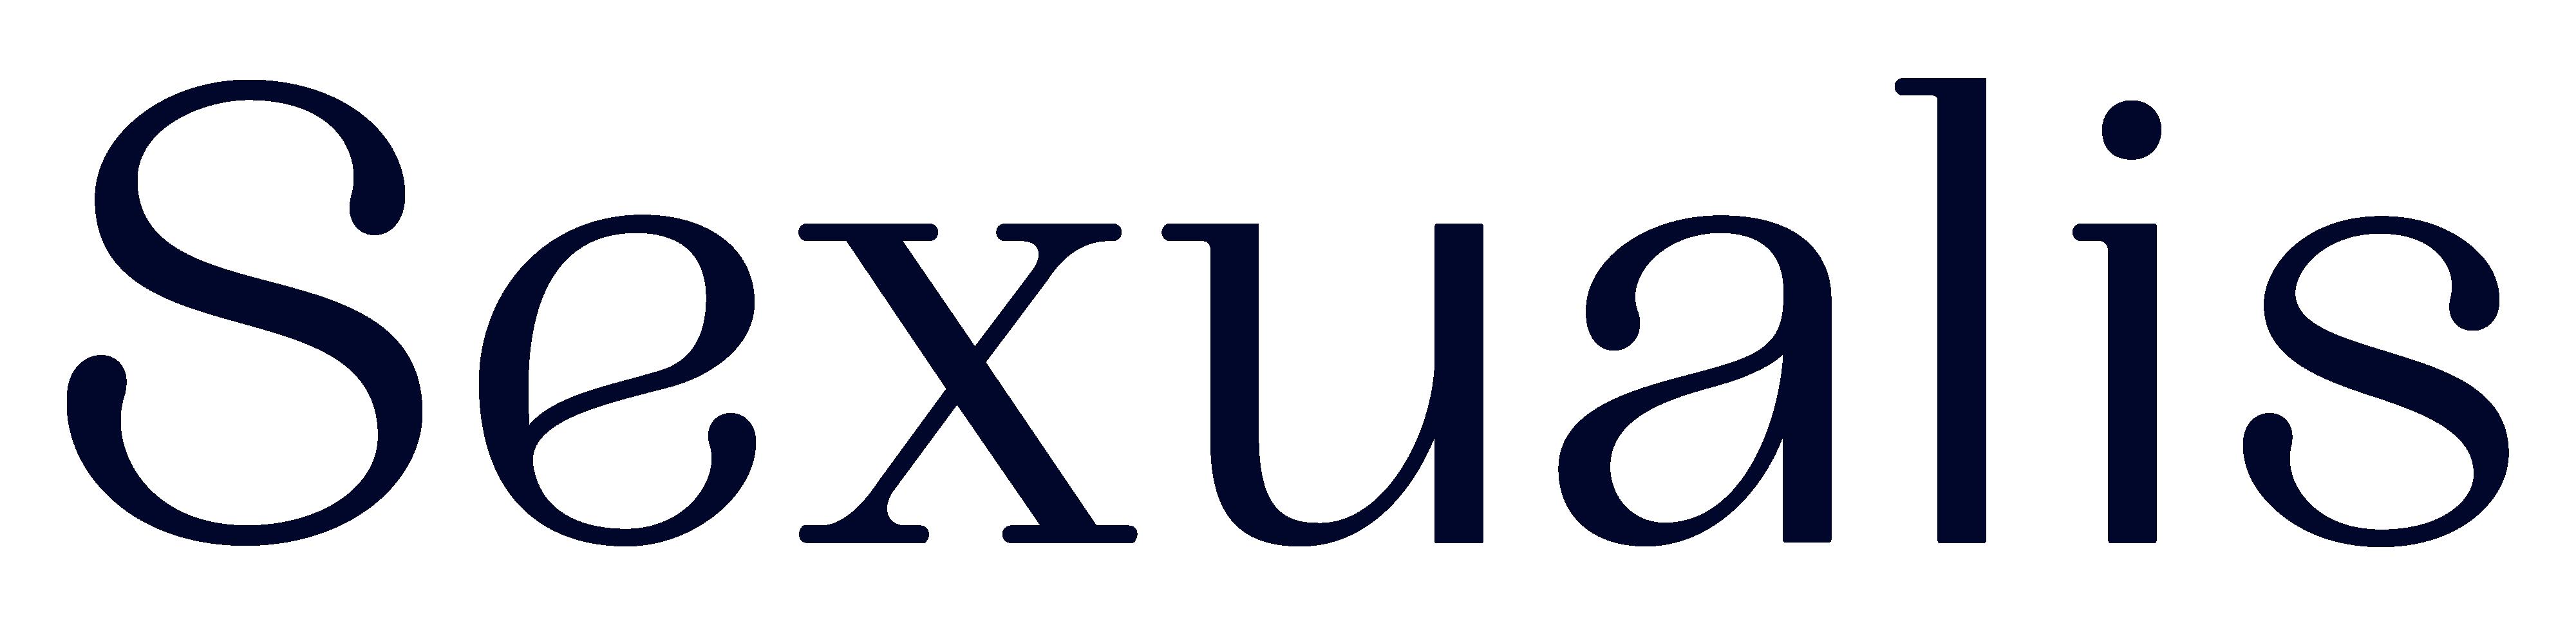 sexualis_logo